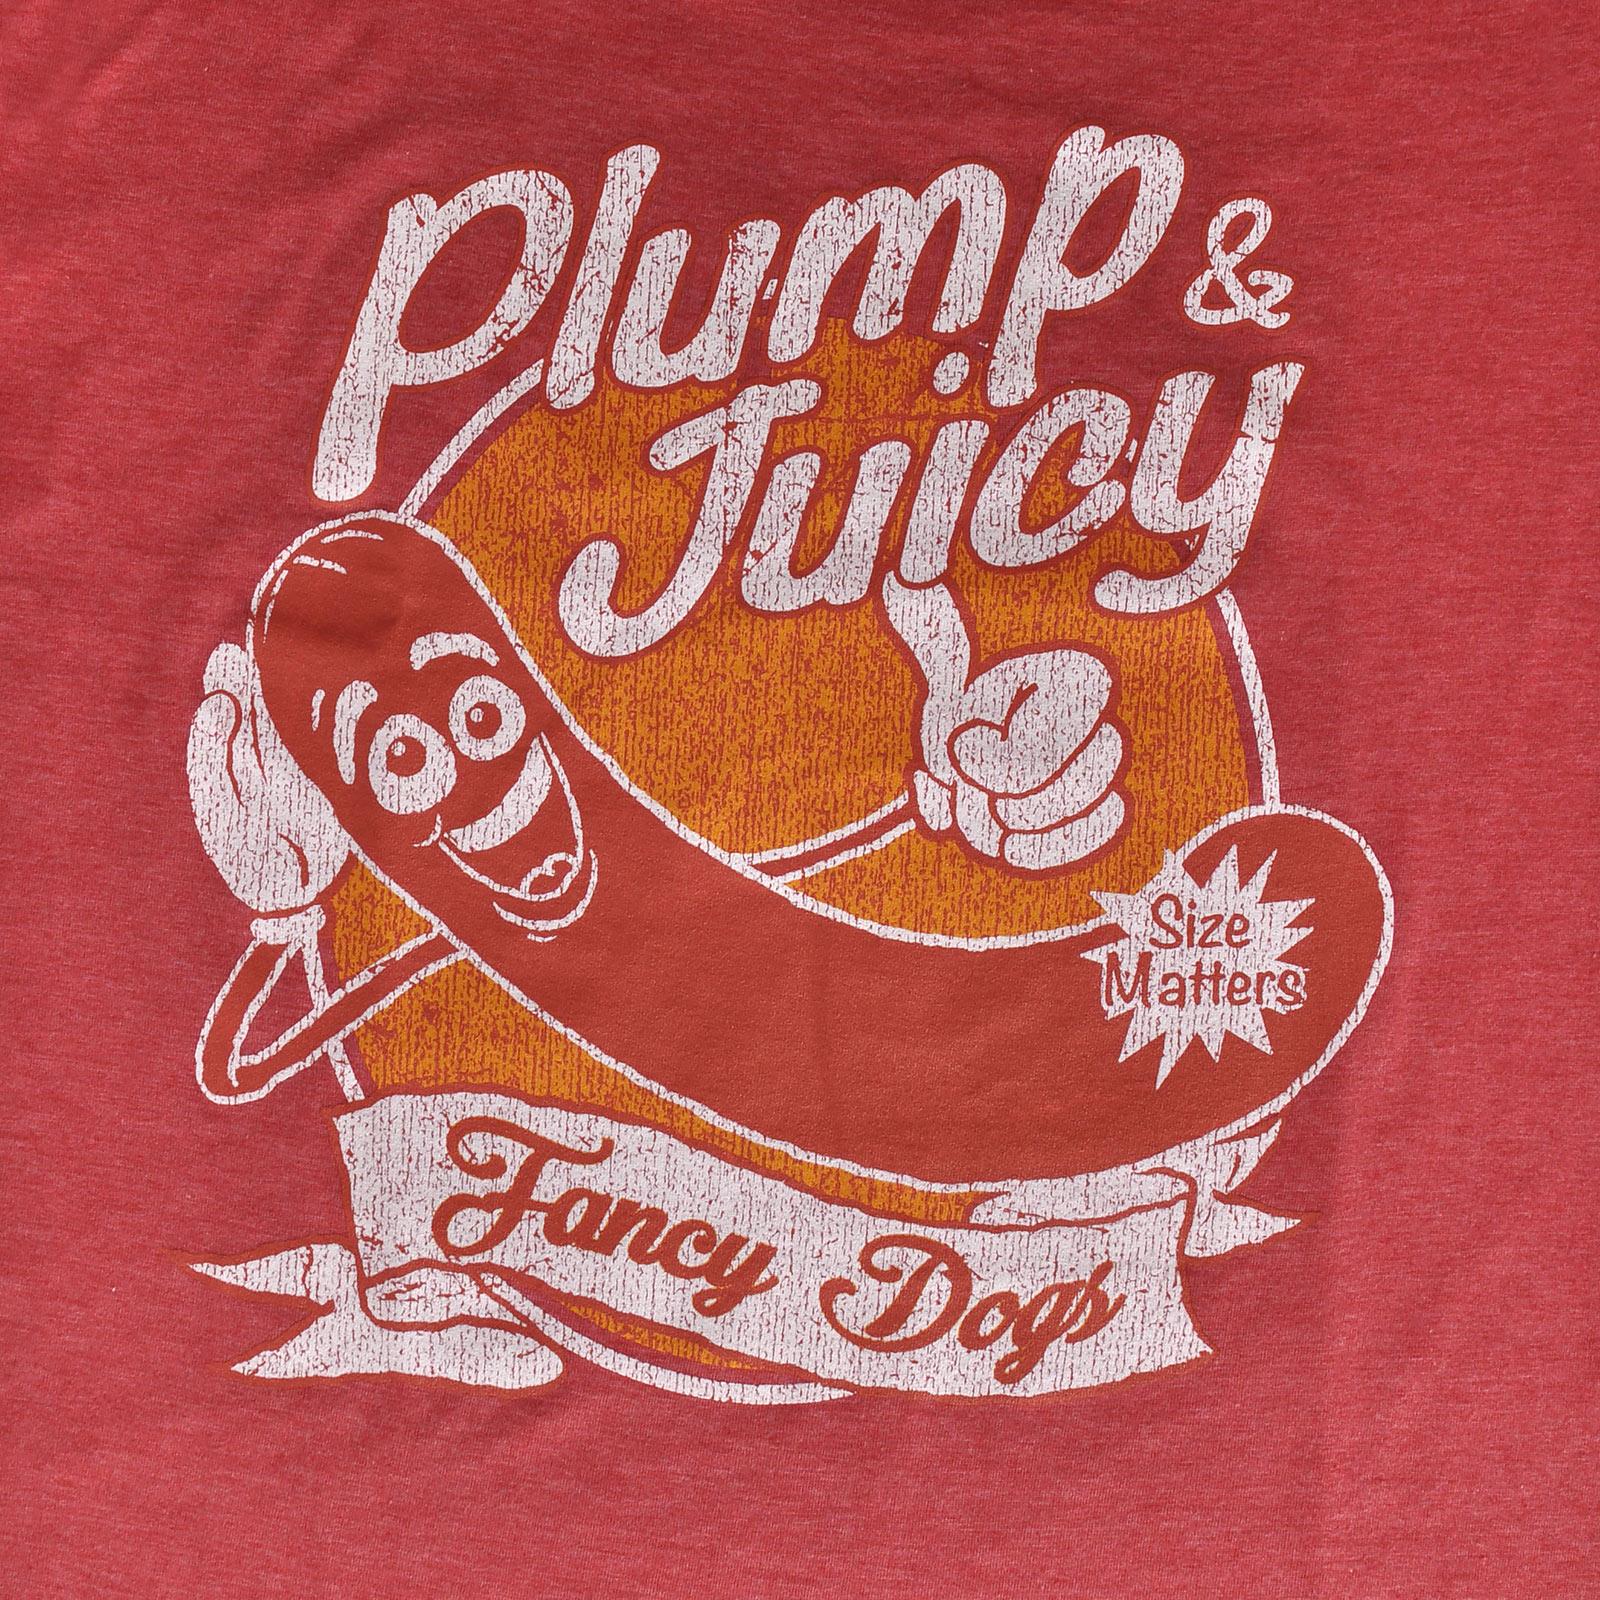 Sausage Party - Plump & Juicy T-Shirt rot